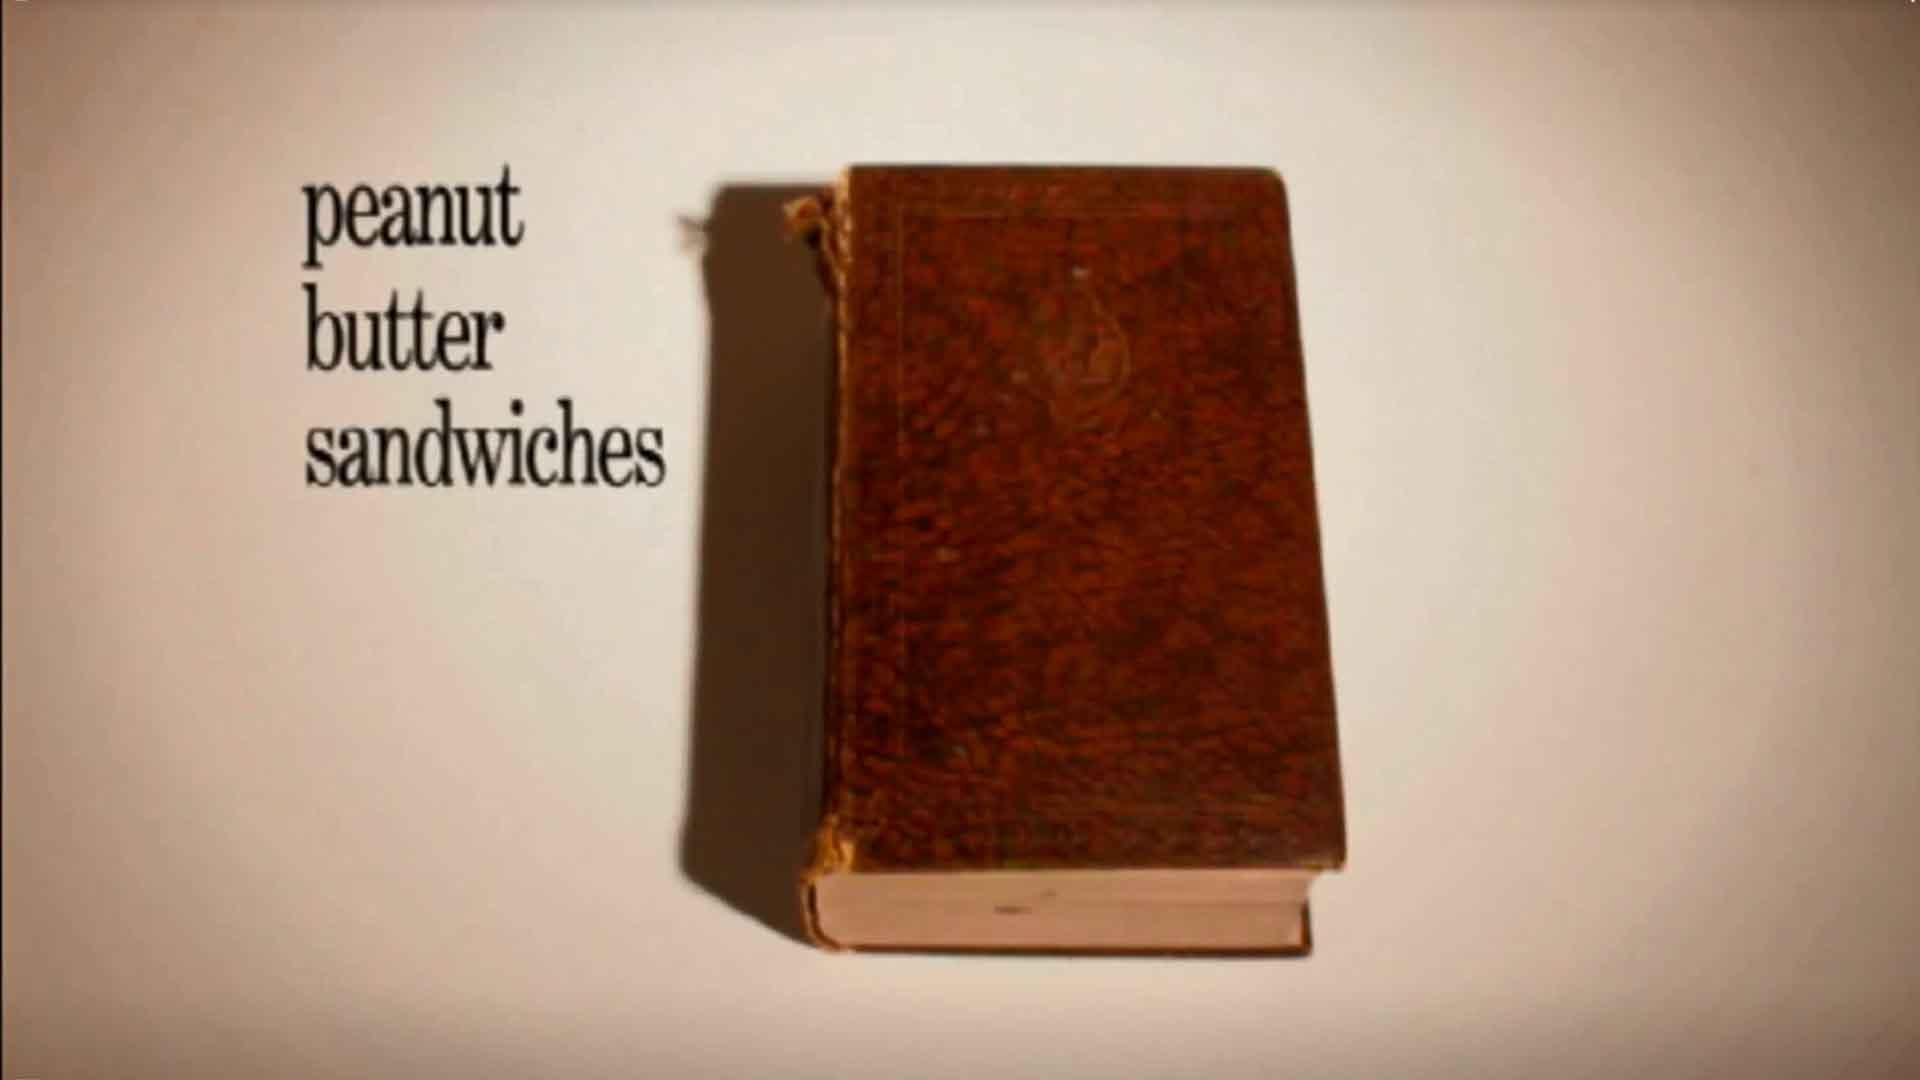 Peanut Butter Sandwi-Michael